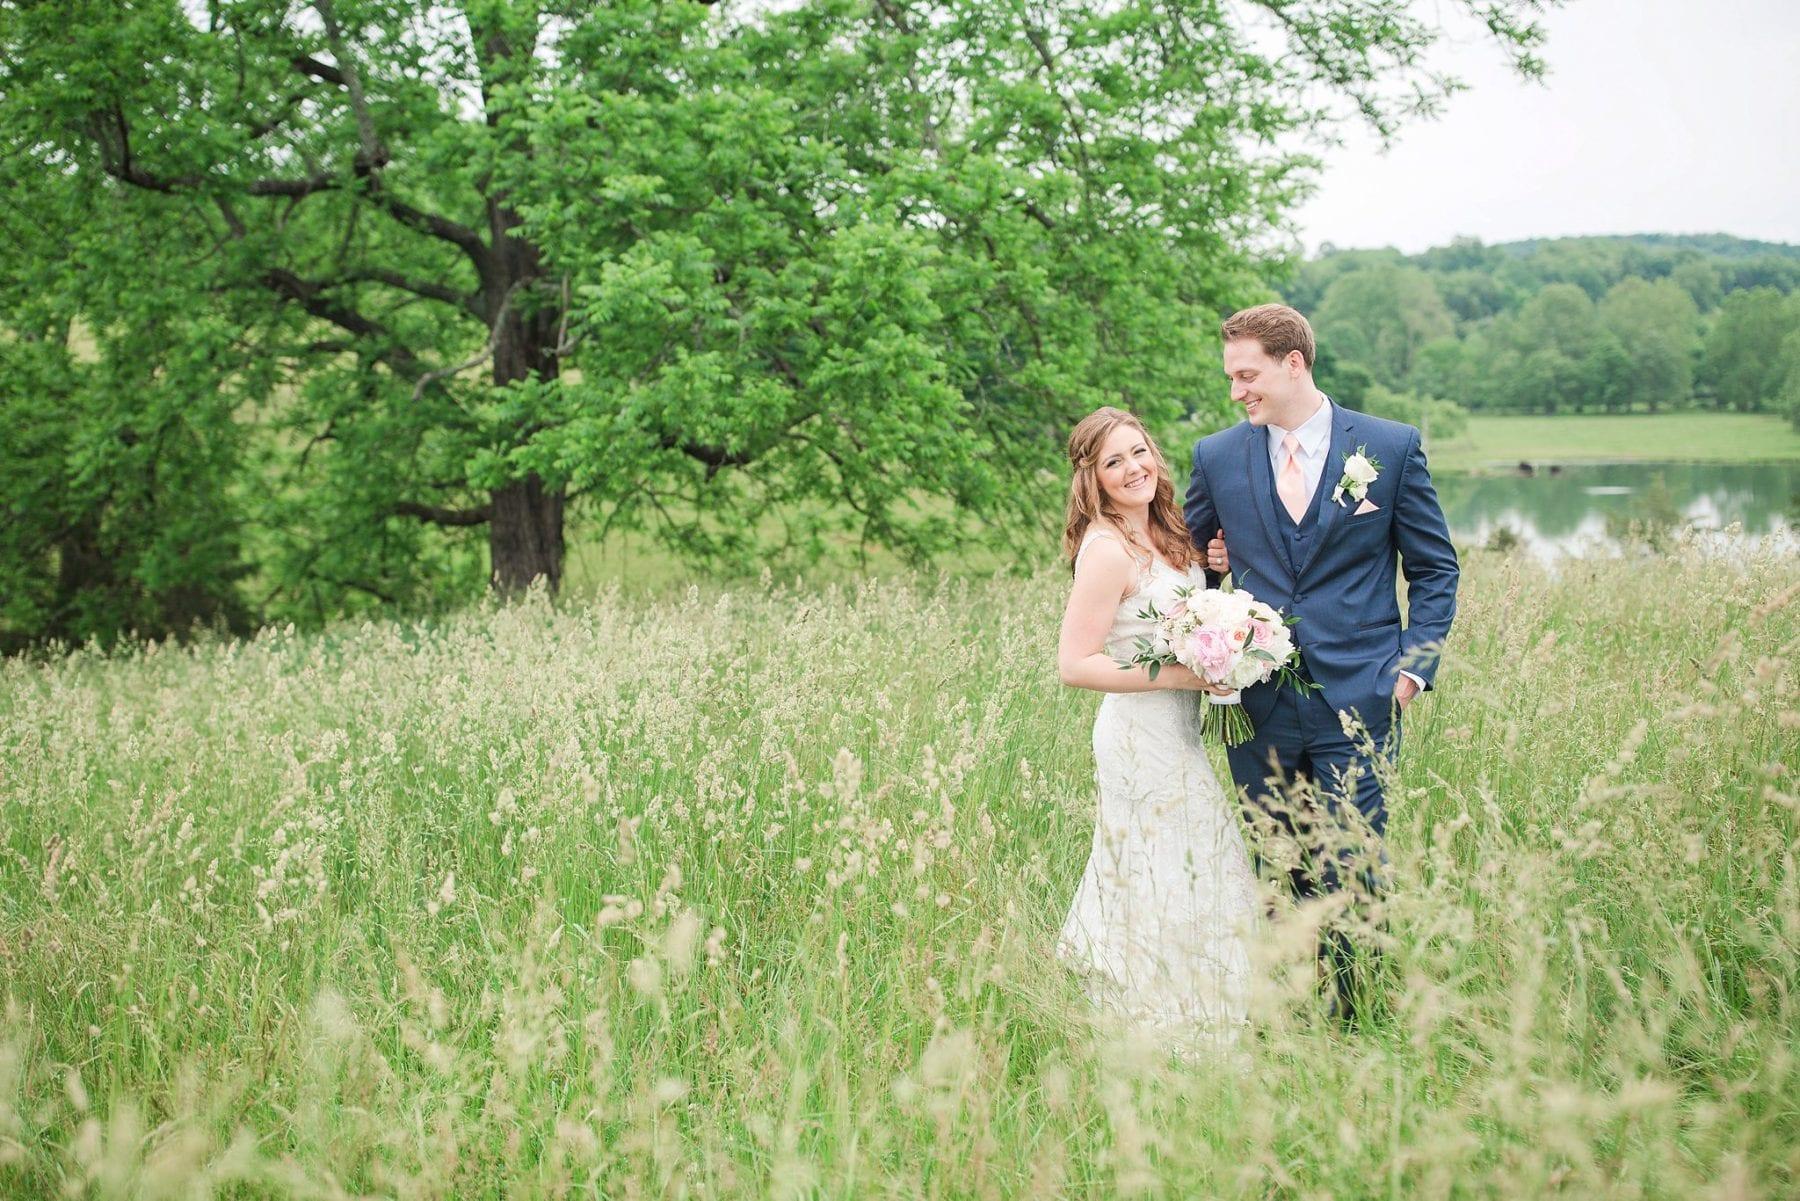 Justin & Megan Big Spring Farm Wedding Photos-430.jpg